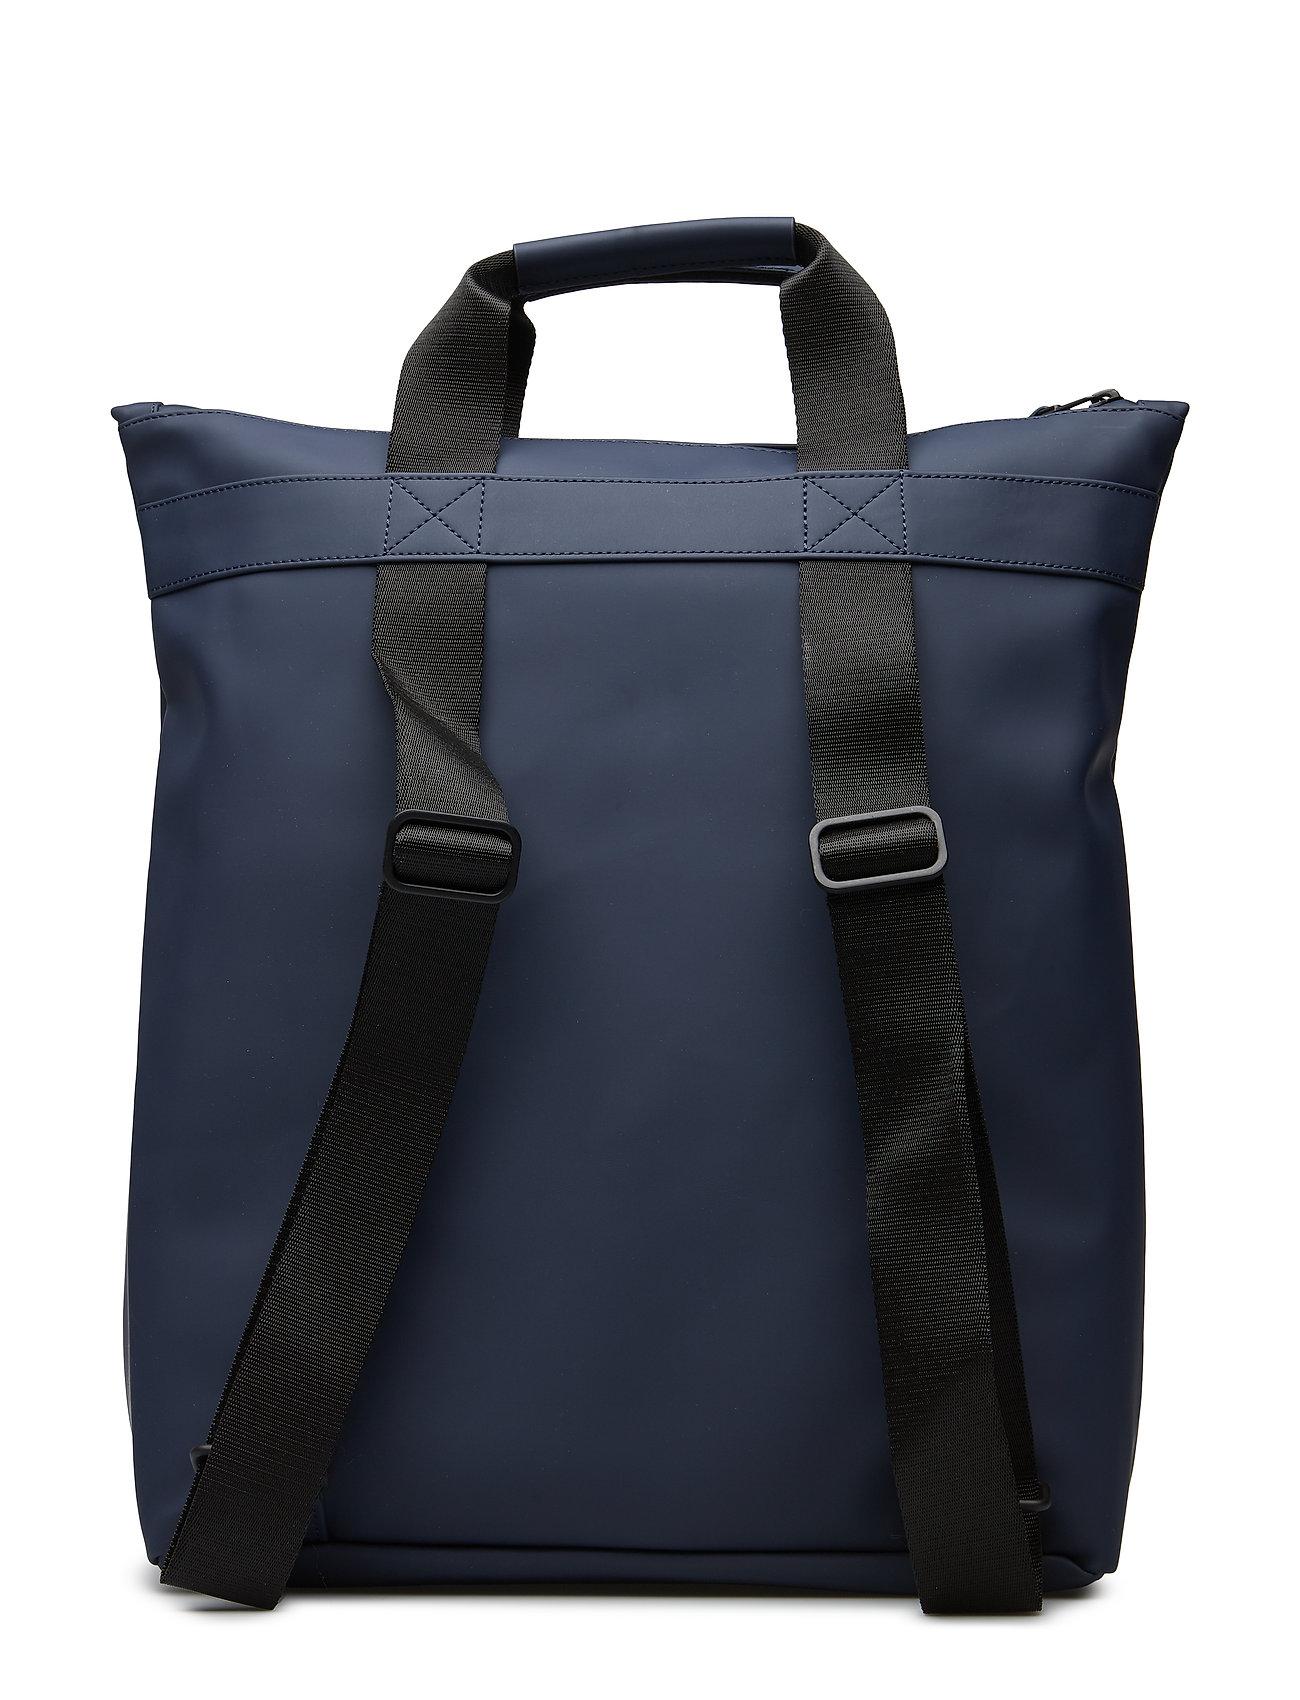 Backpack02 Backpack02 Tote Backpack02 Tote BlueRains Backpack02 BlueRains Tote Backpack02 Tote BlueRains BlueRains Tote BlueRains wXnPk80O